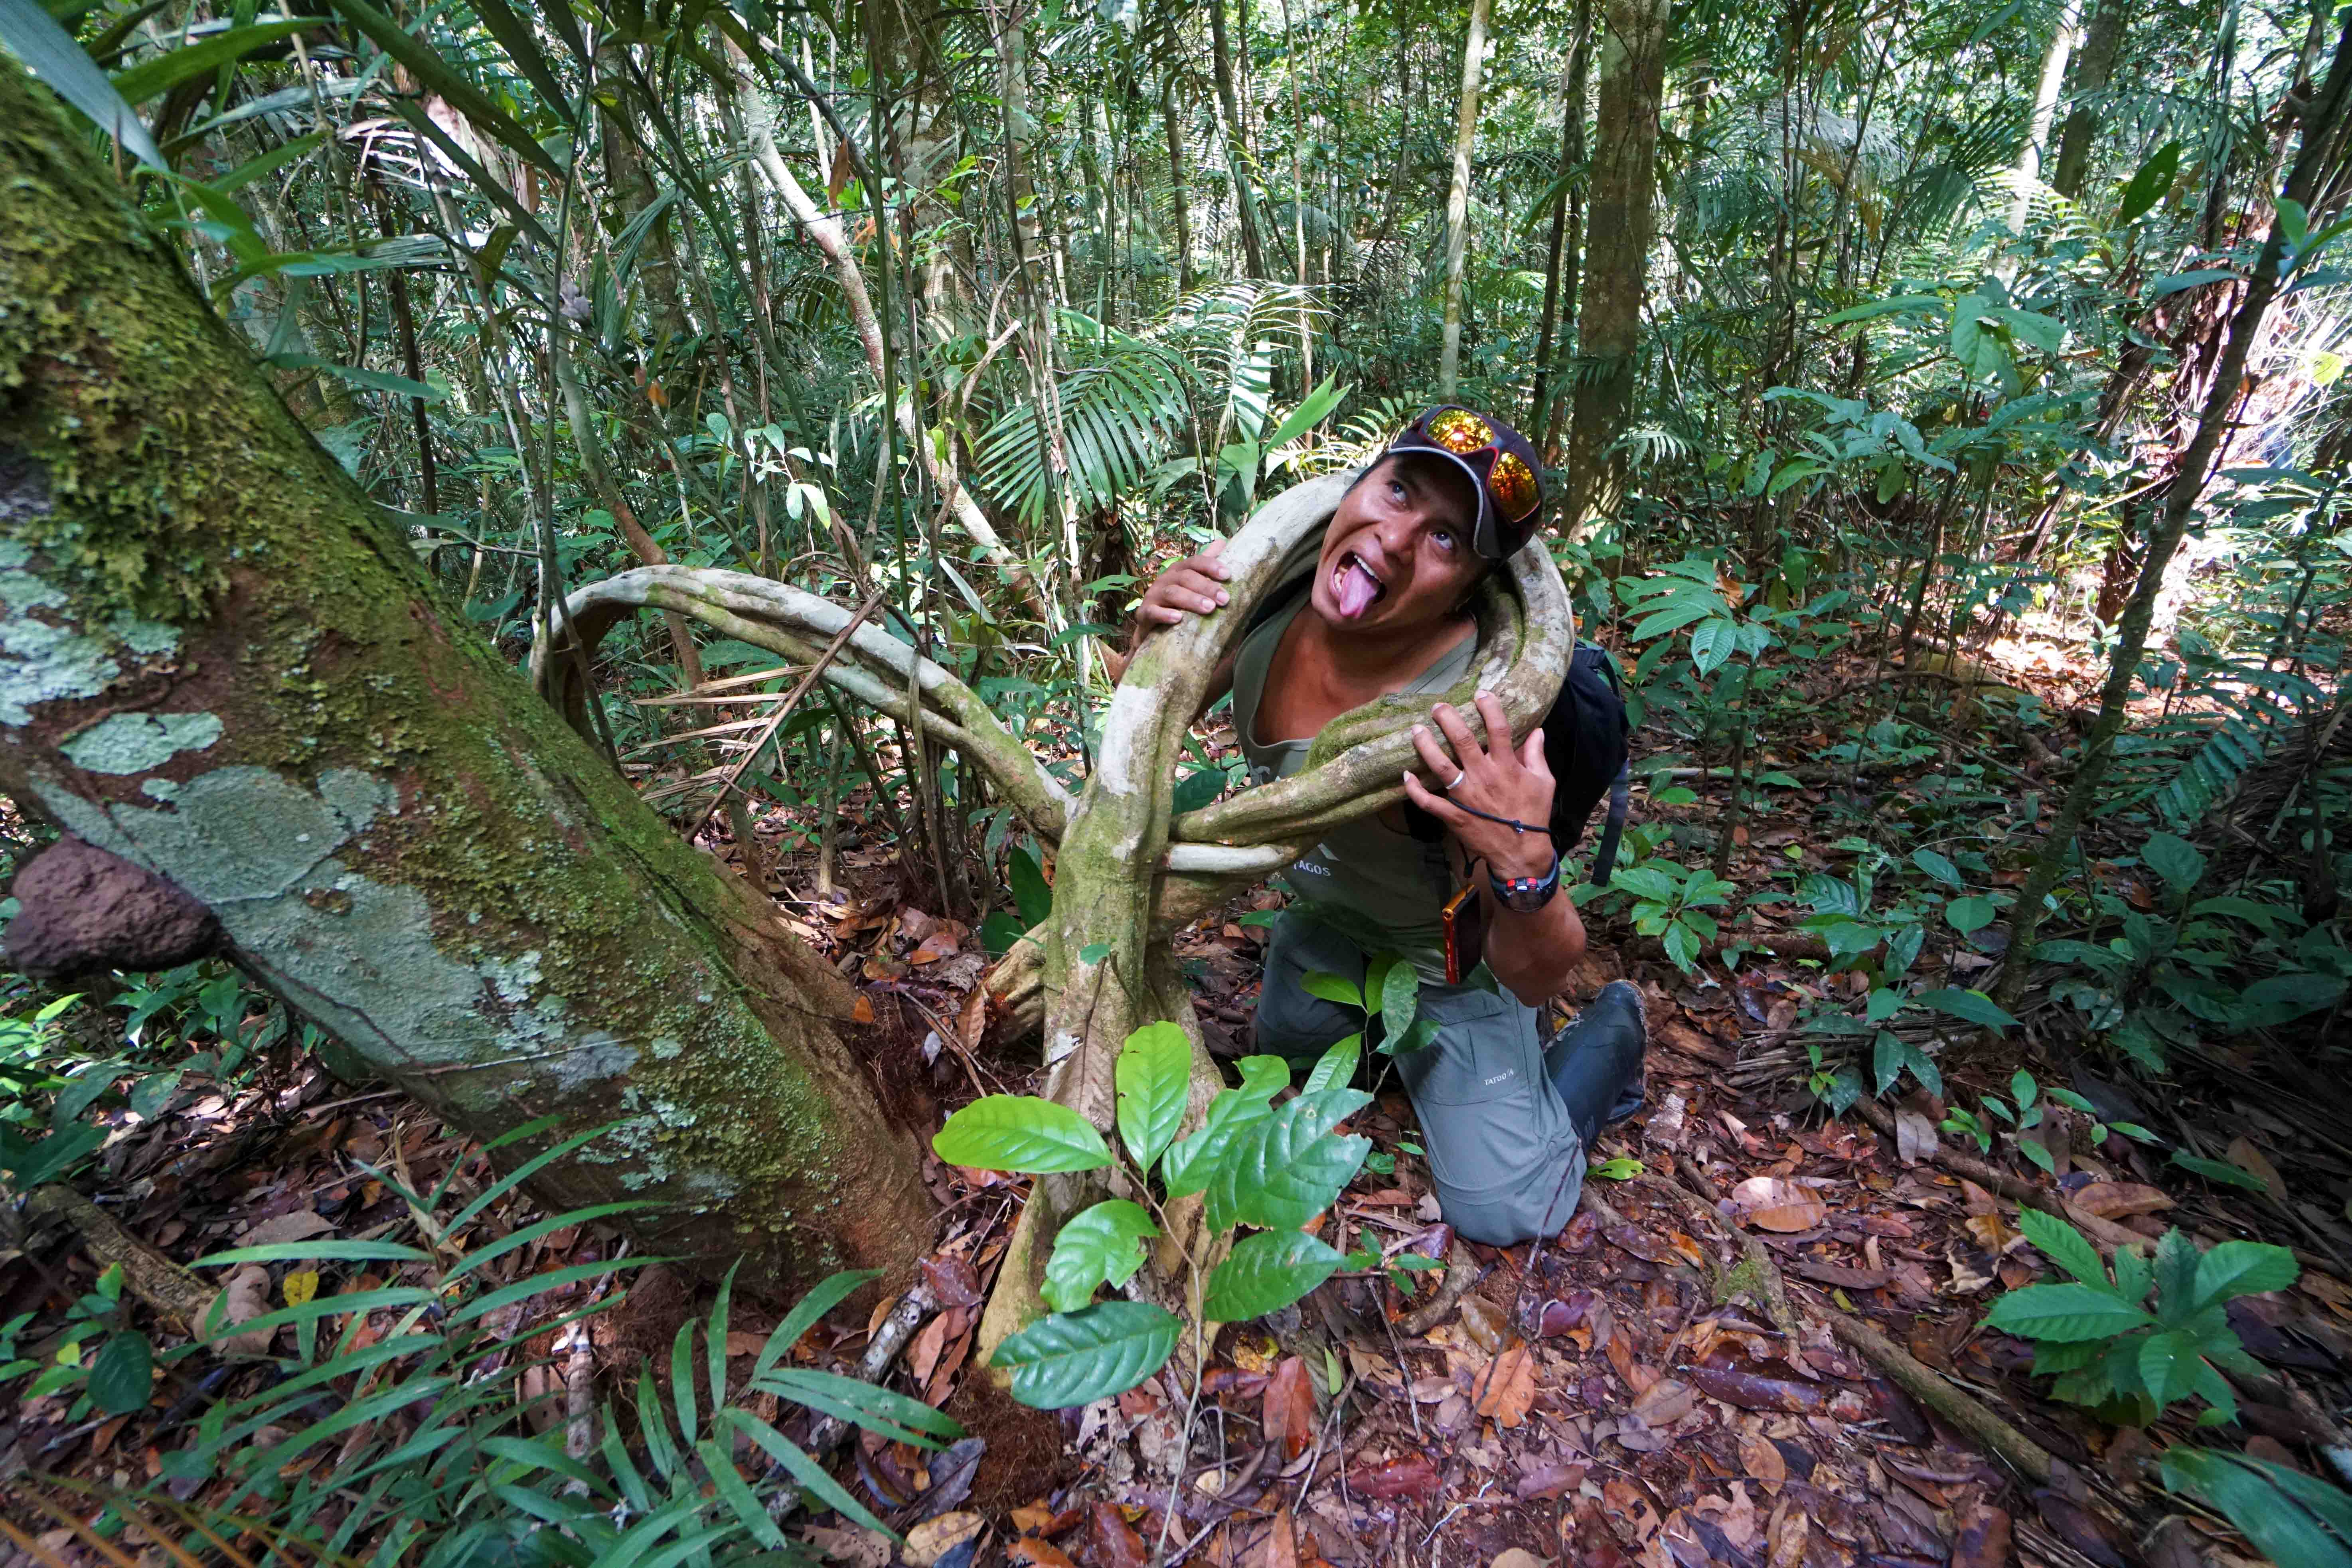 8 Miguel strangled by tree sm